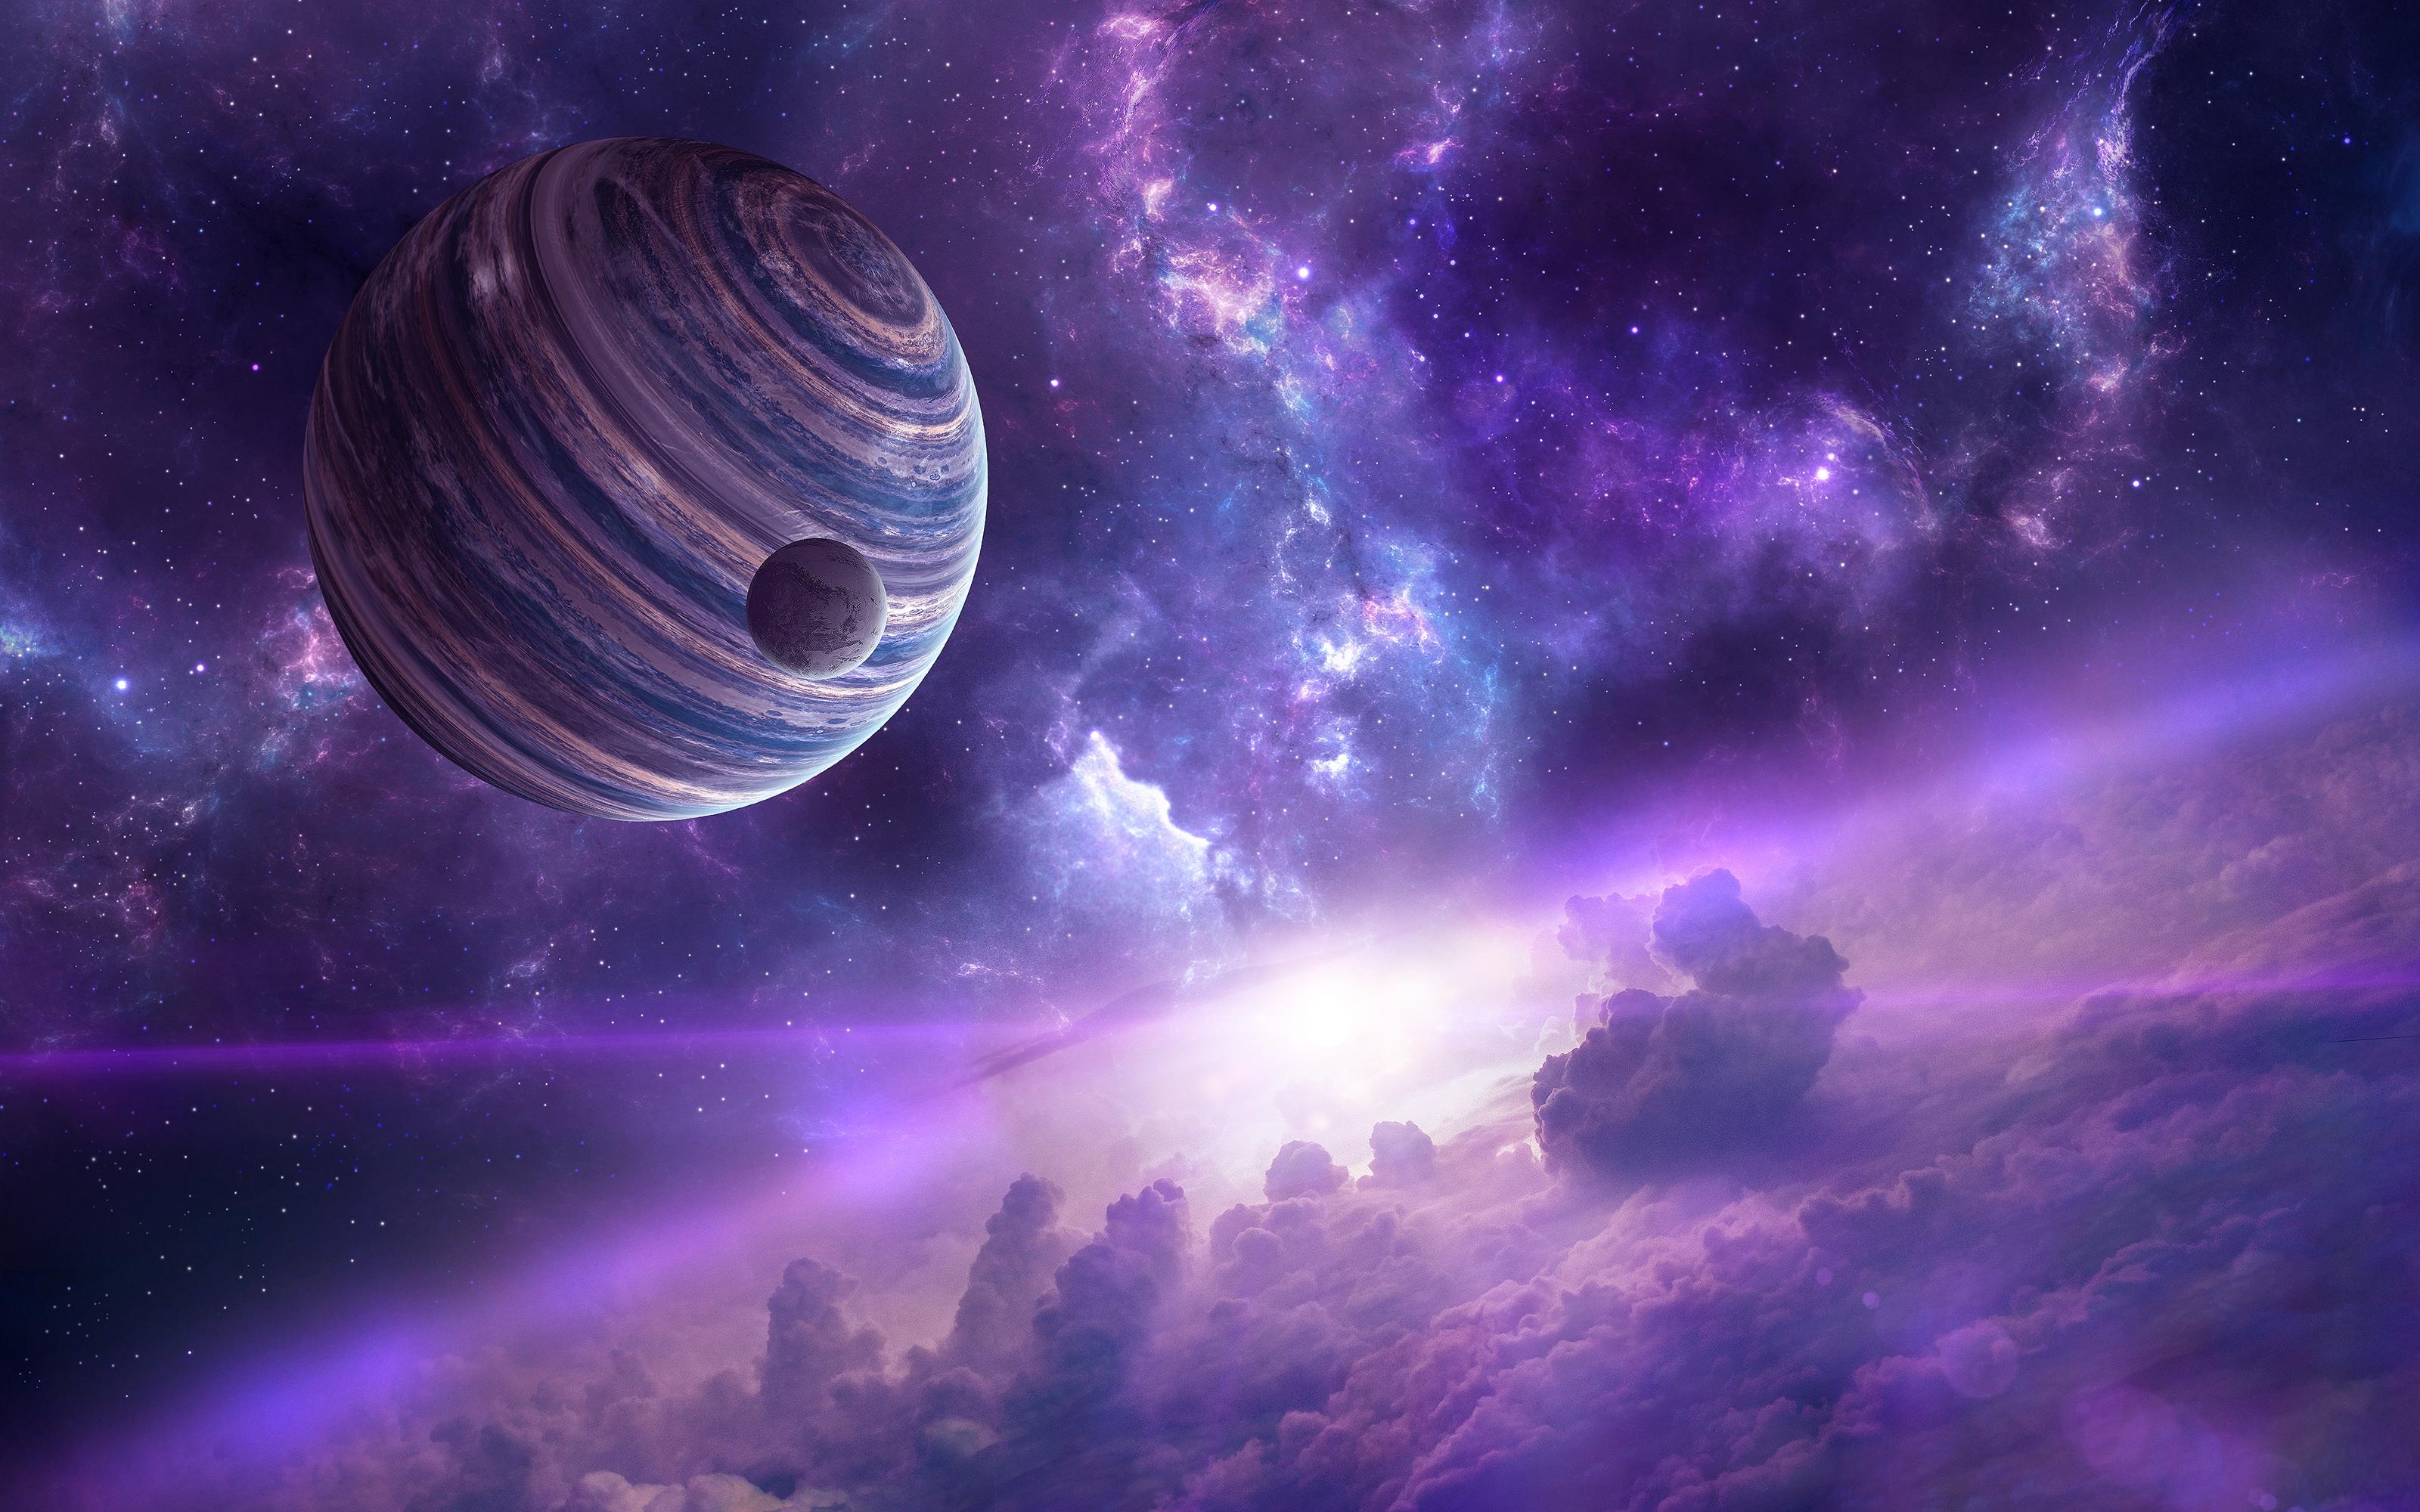 Purple space hd wallpaper background image 3200x2000 - Purple space wallpaper ...